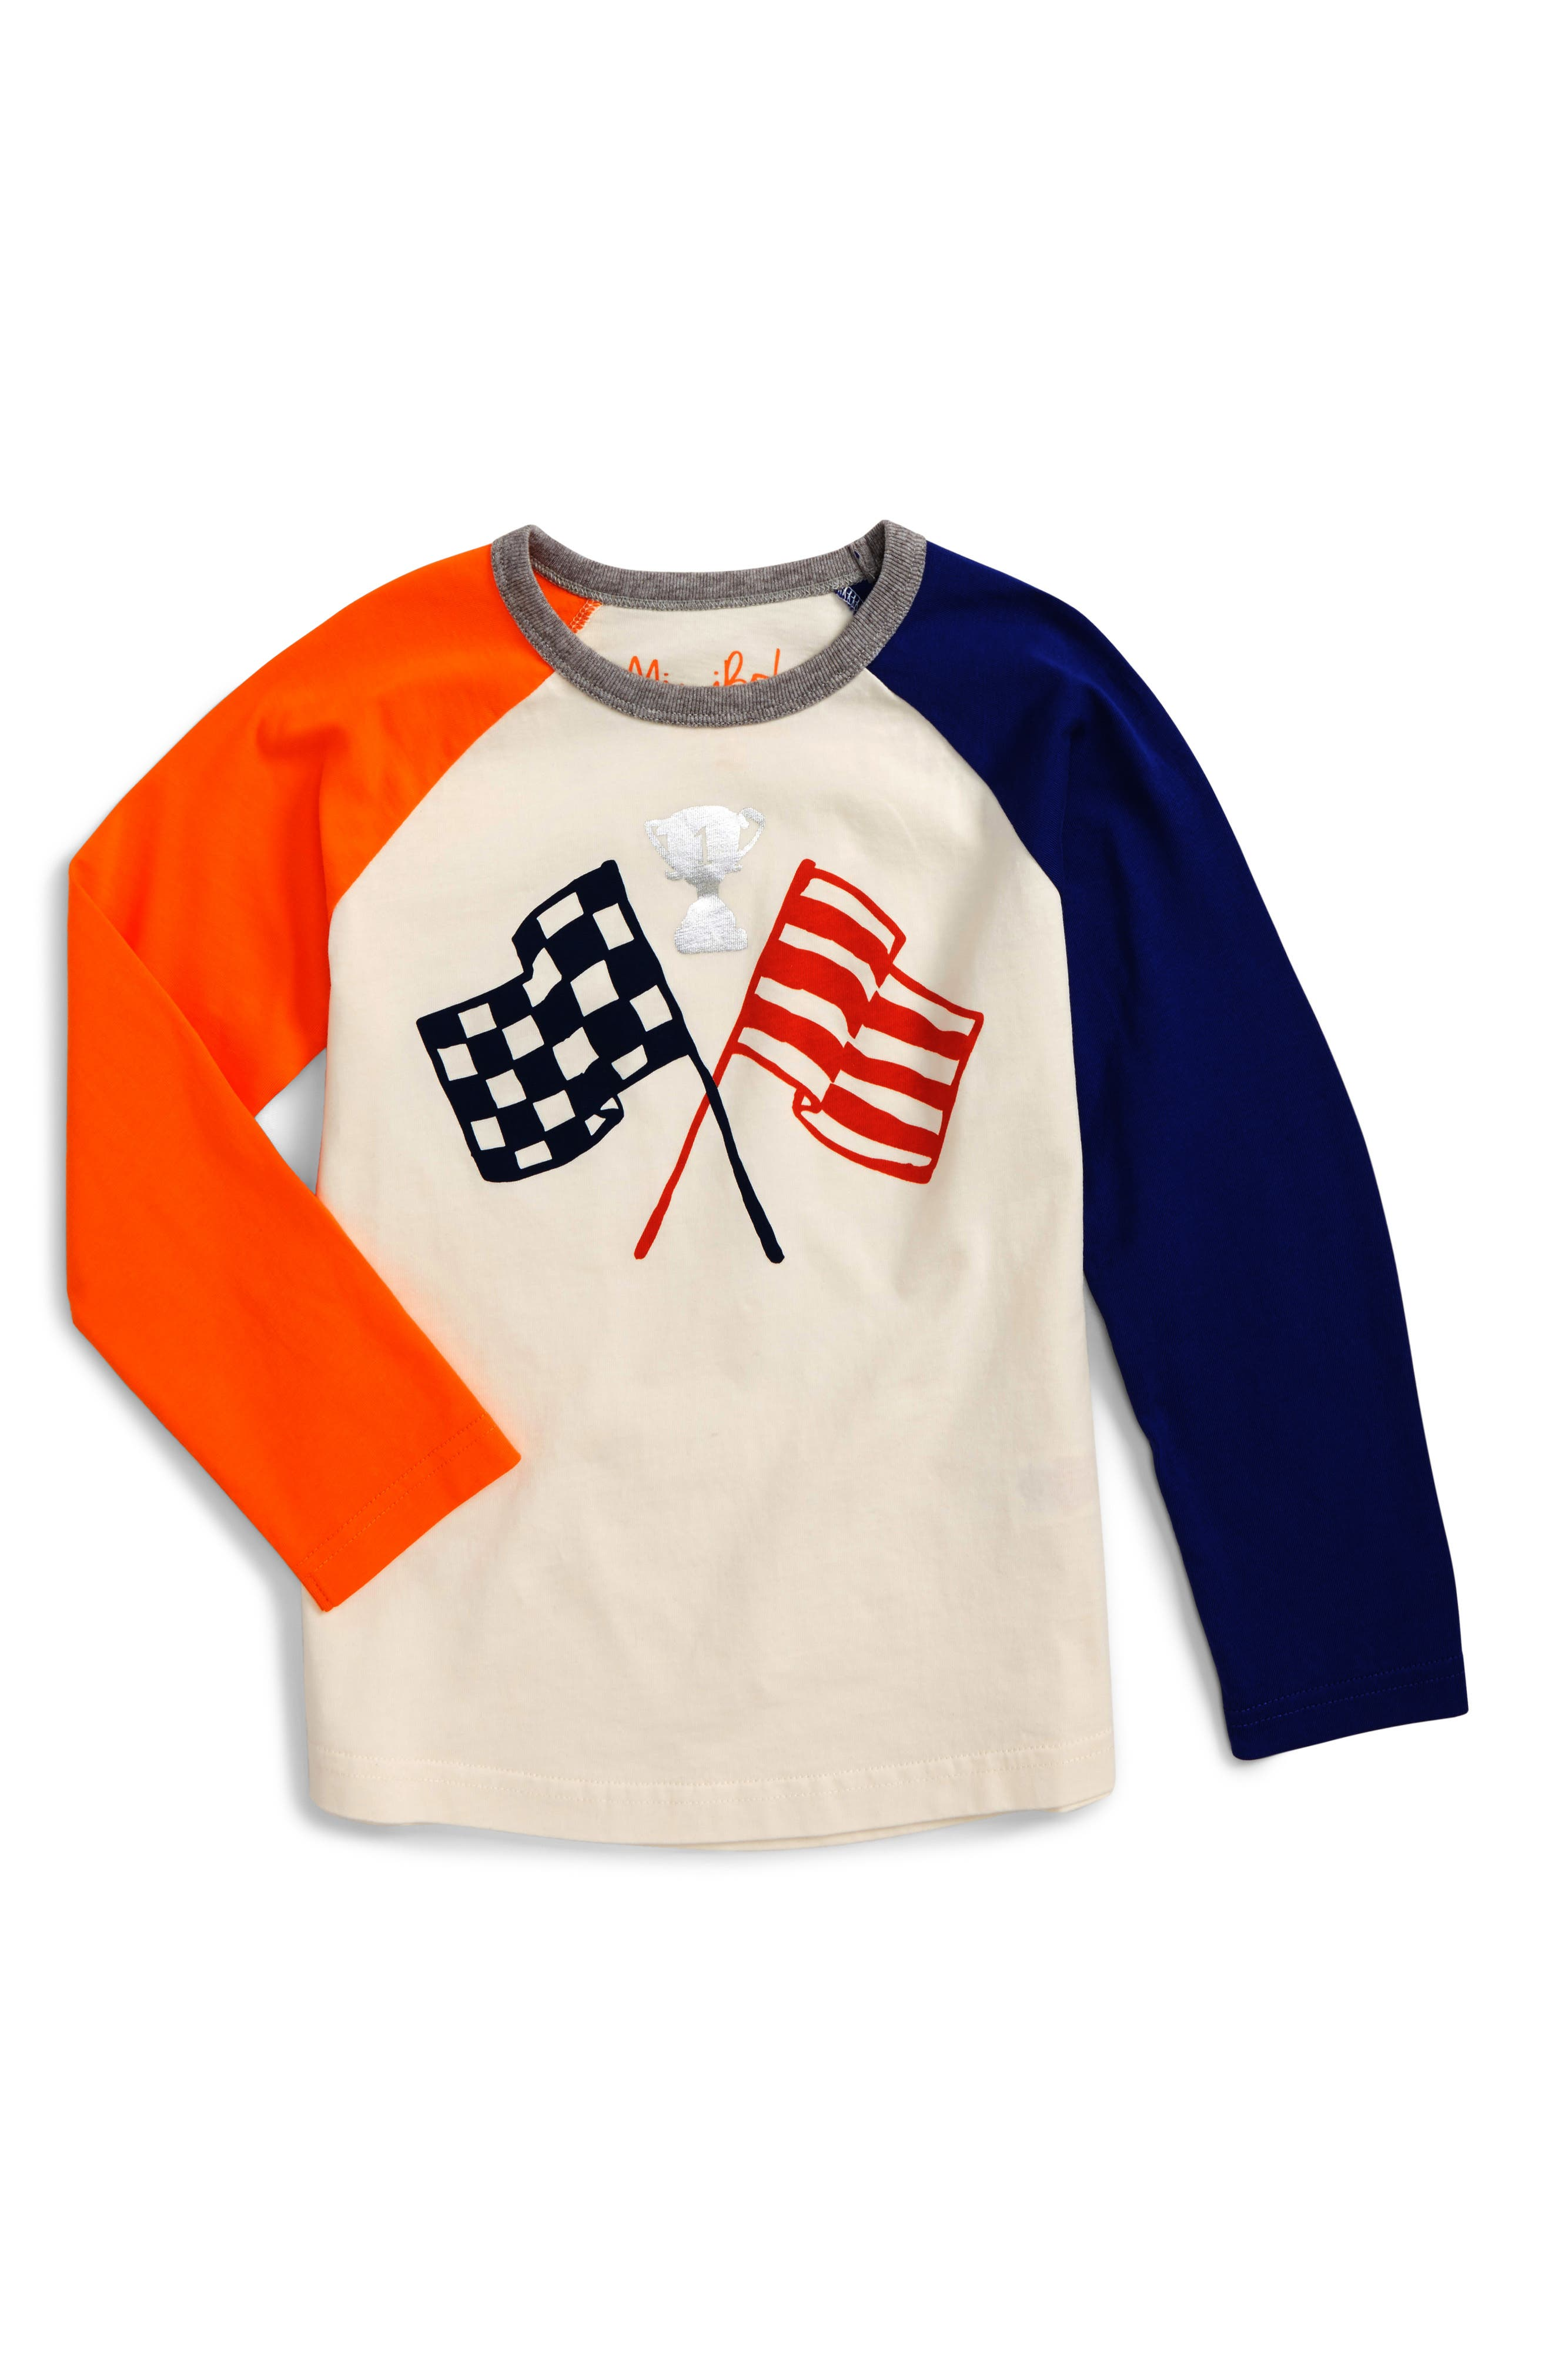 Alternate Image 1 Selected - Mini Boden Hotchpotch Raglan T-Shirt (Todder Boys, Little Boys & Big Boys)